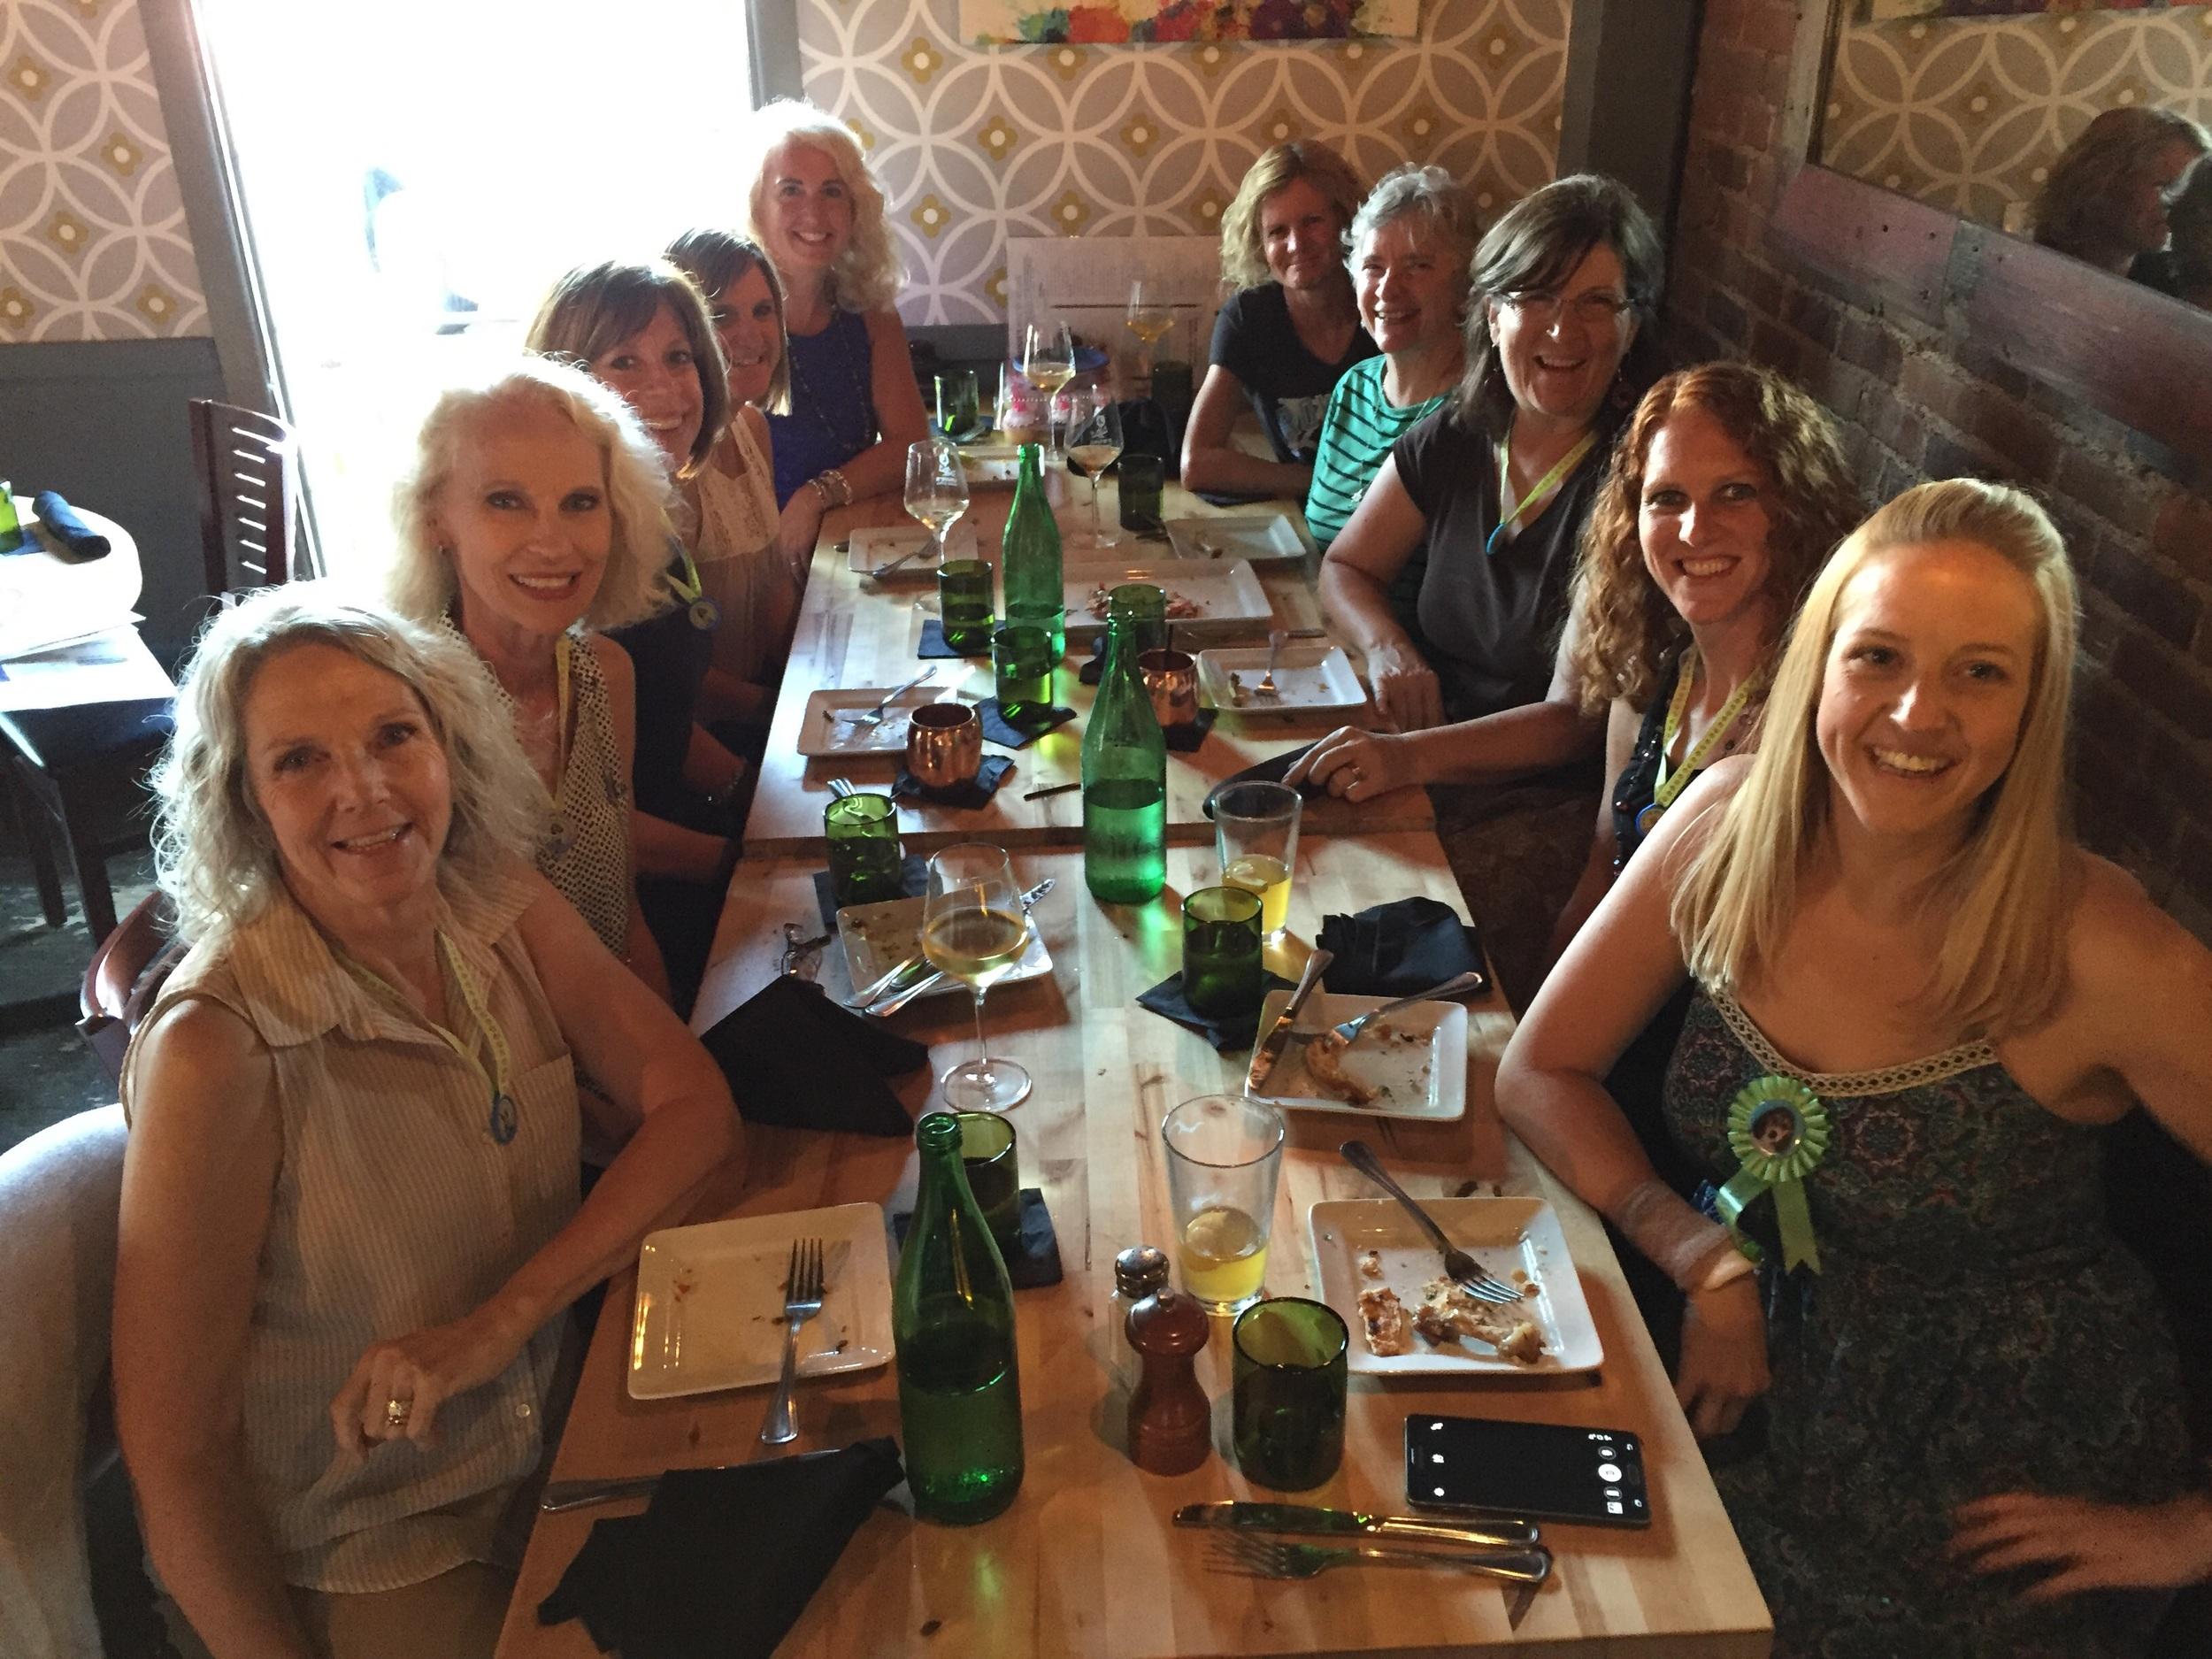 Birthday girls - Cheryl, Amity, Deidre and Ashby!! Great and very fun friends!